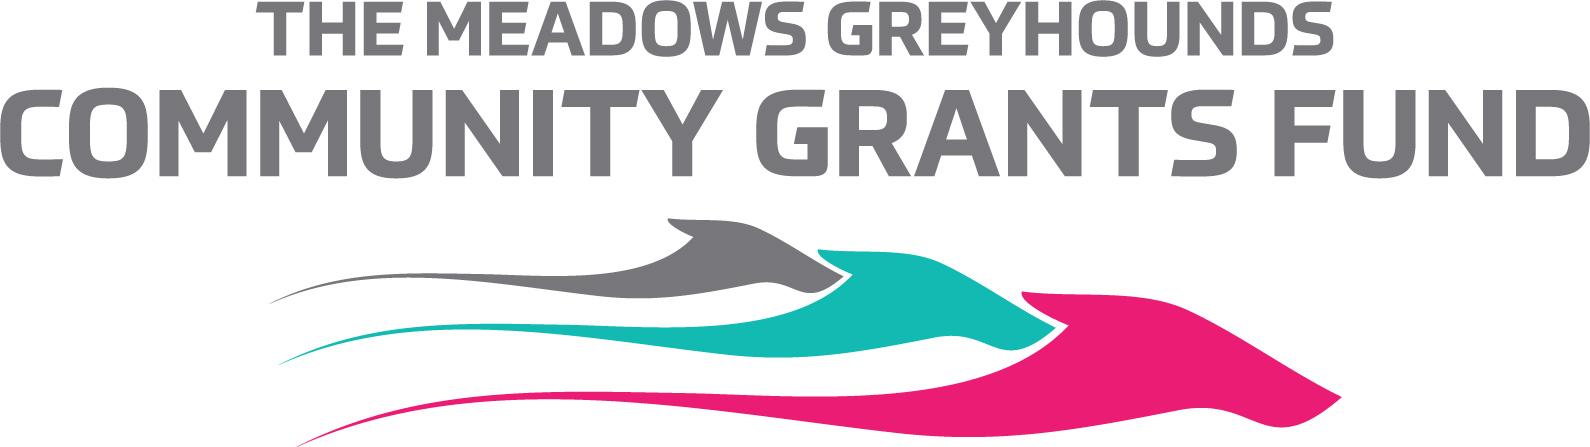 Grants Fund Logo